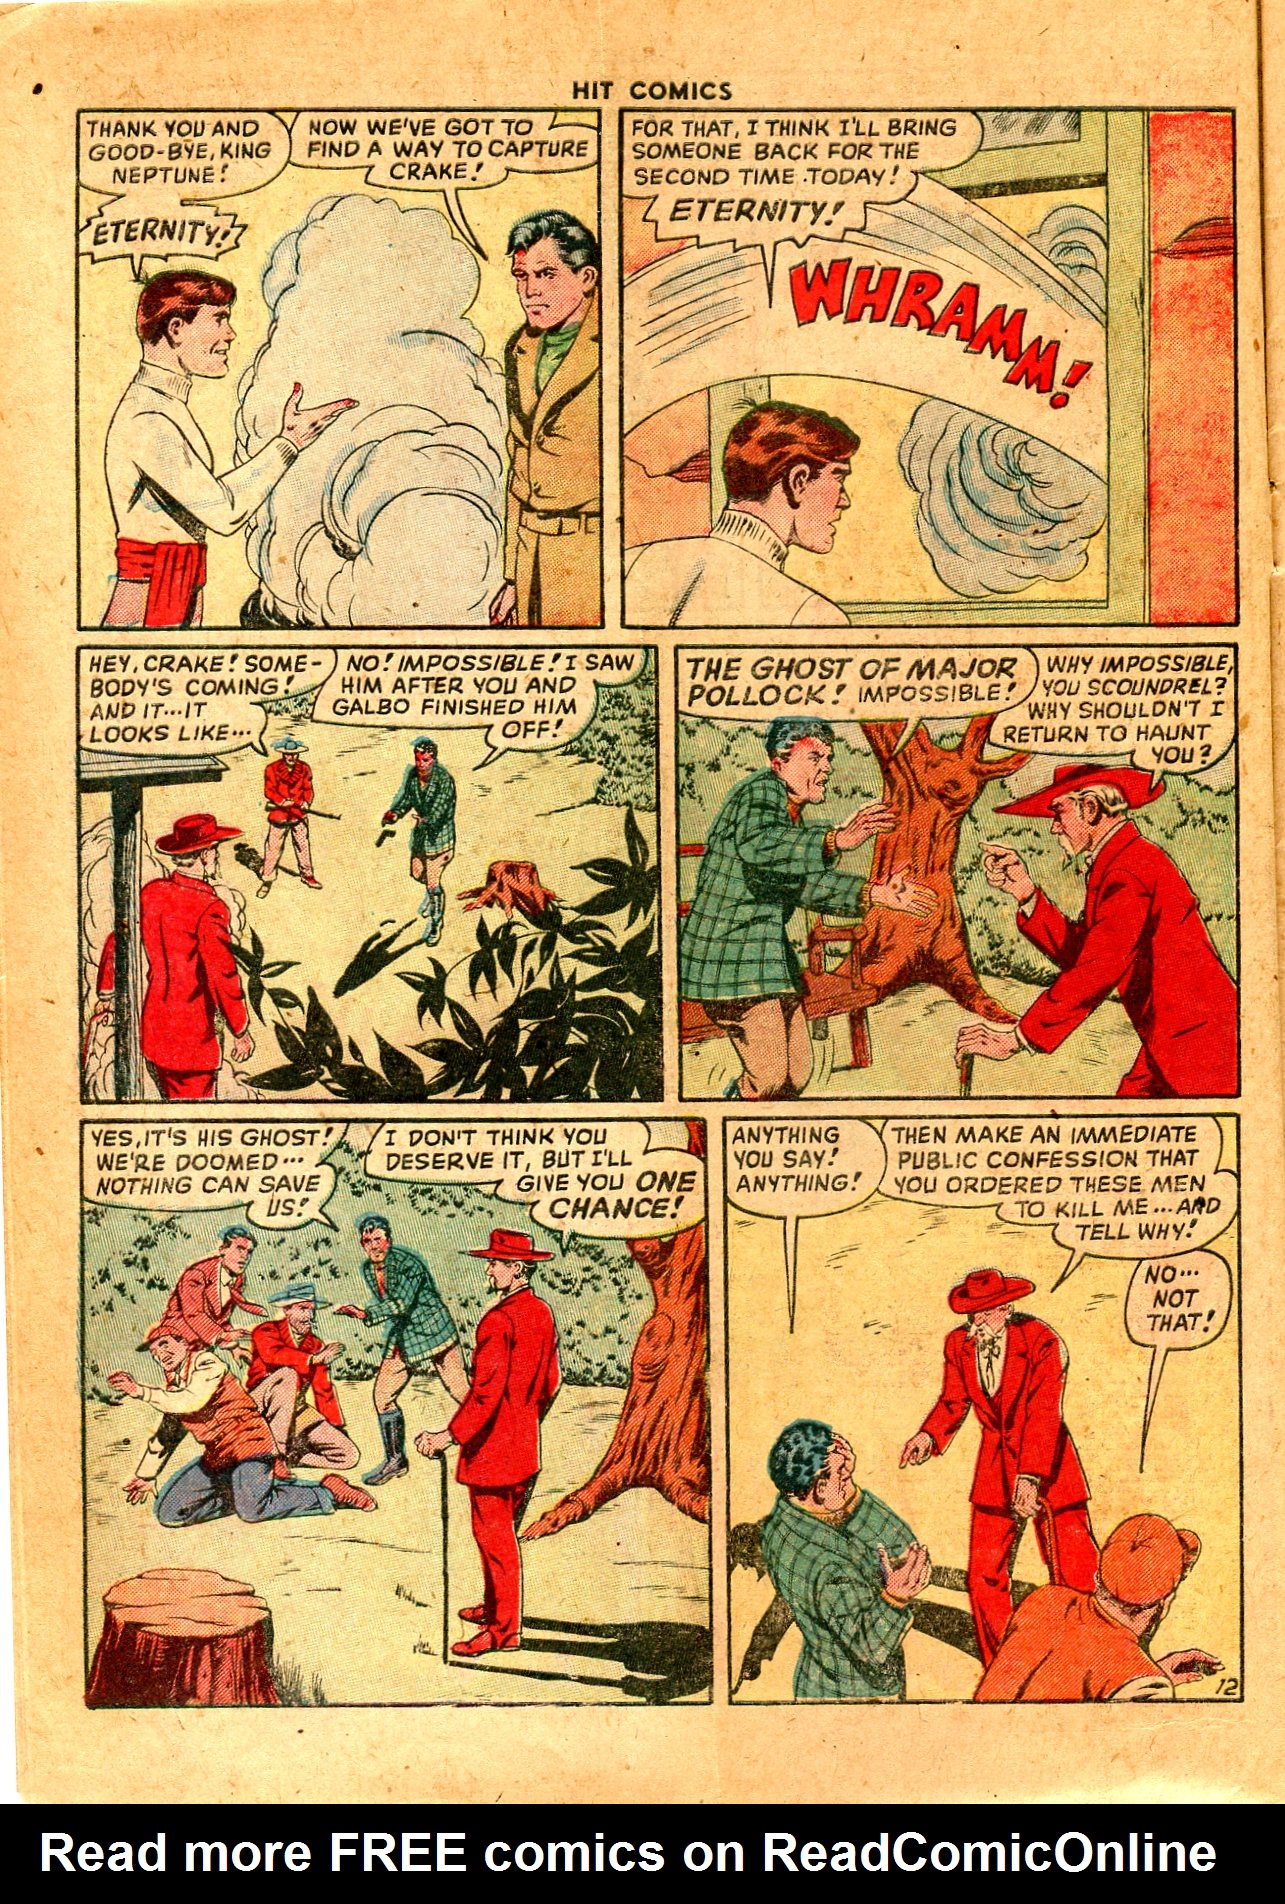 Read online Hit Comics comic -  Issue #57 - 14